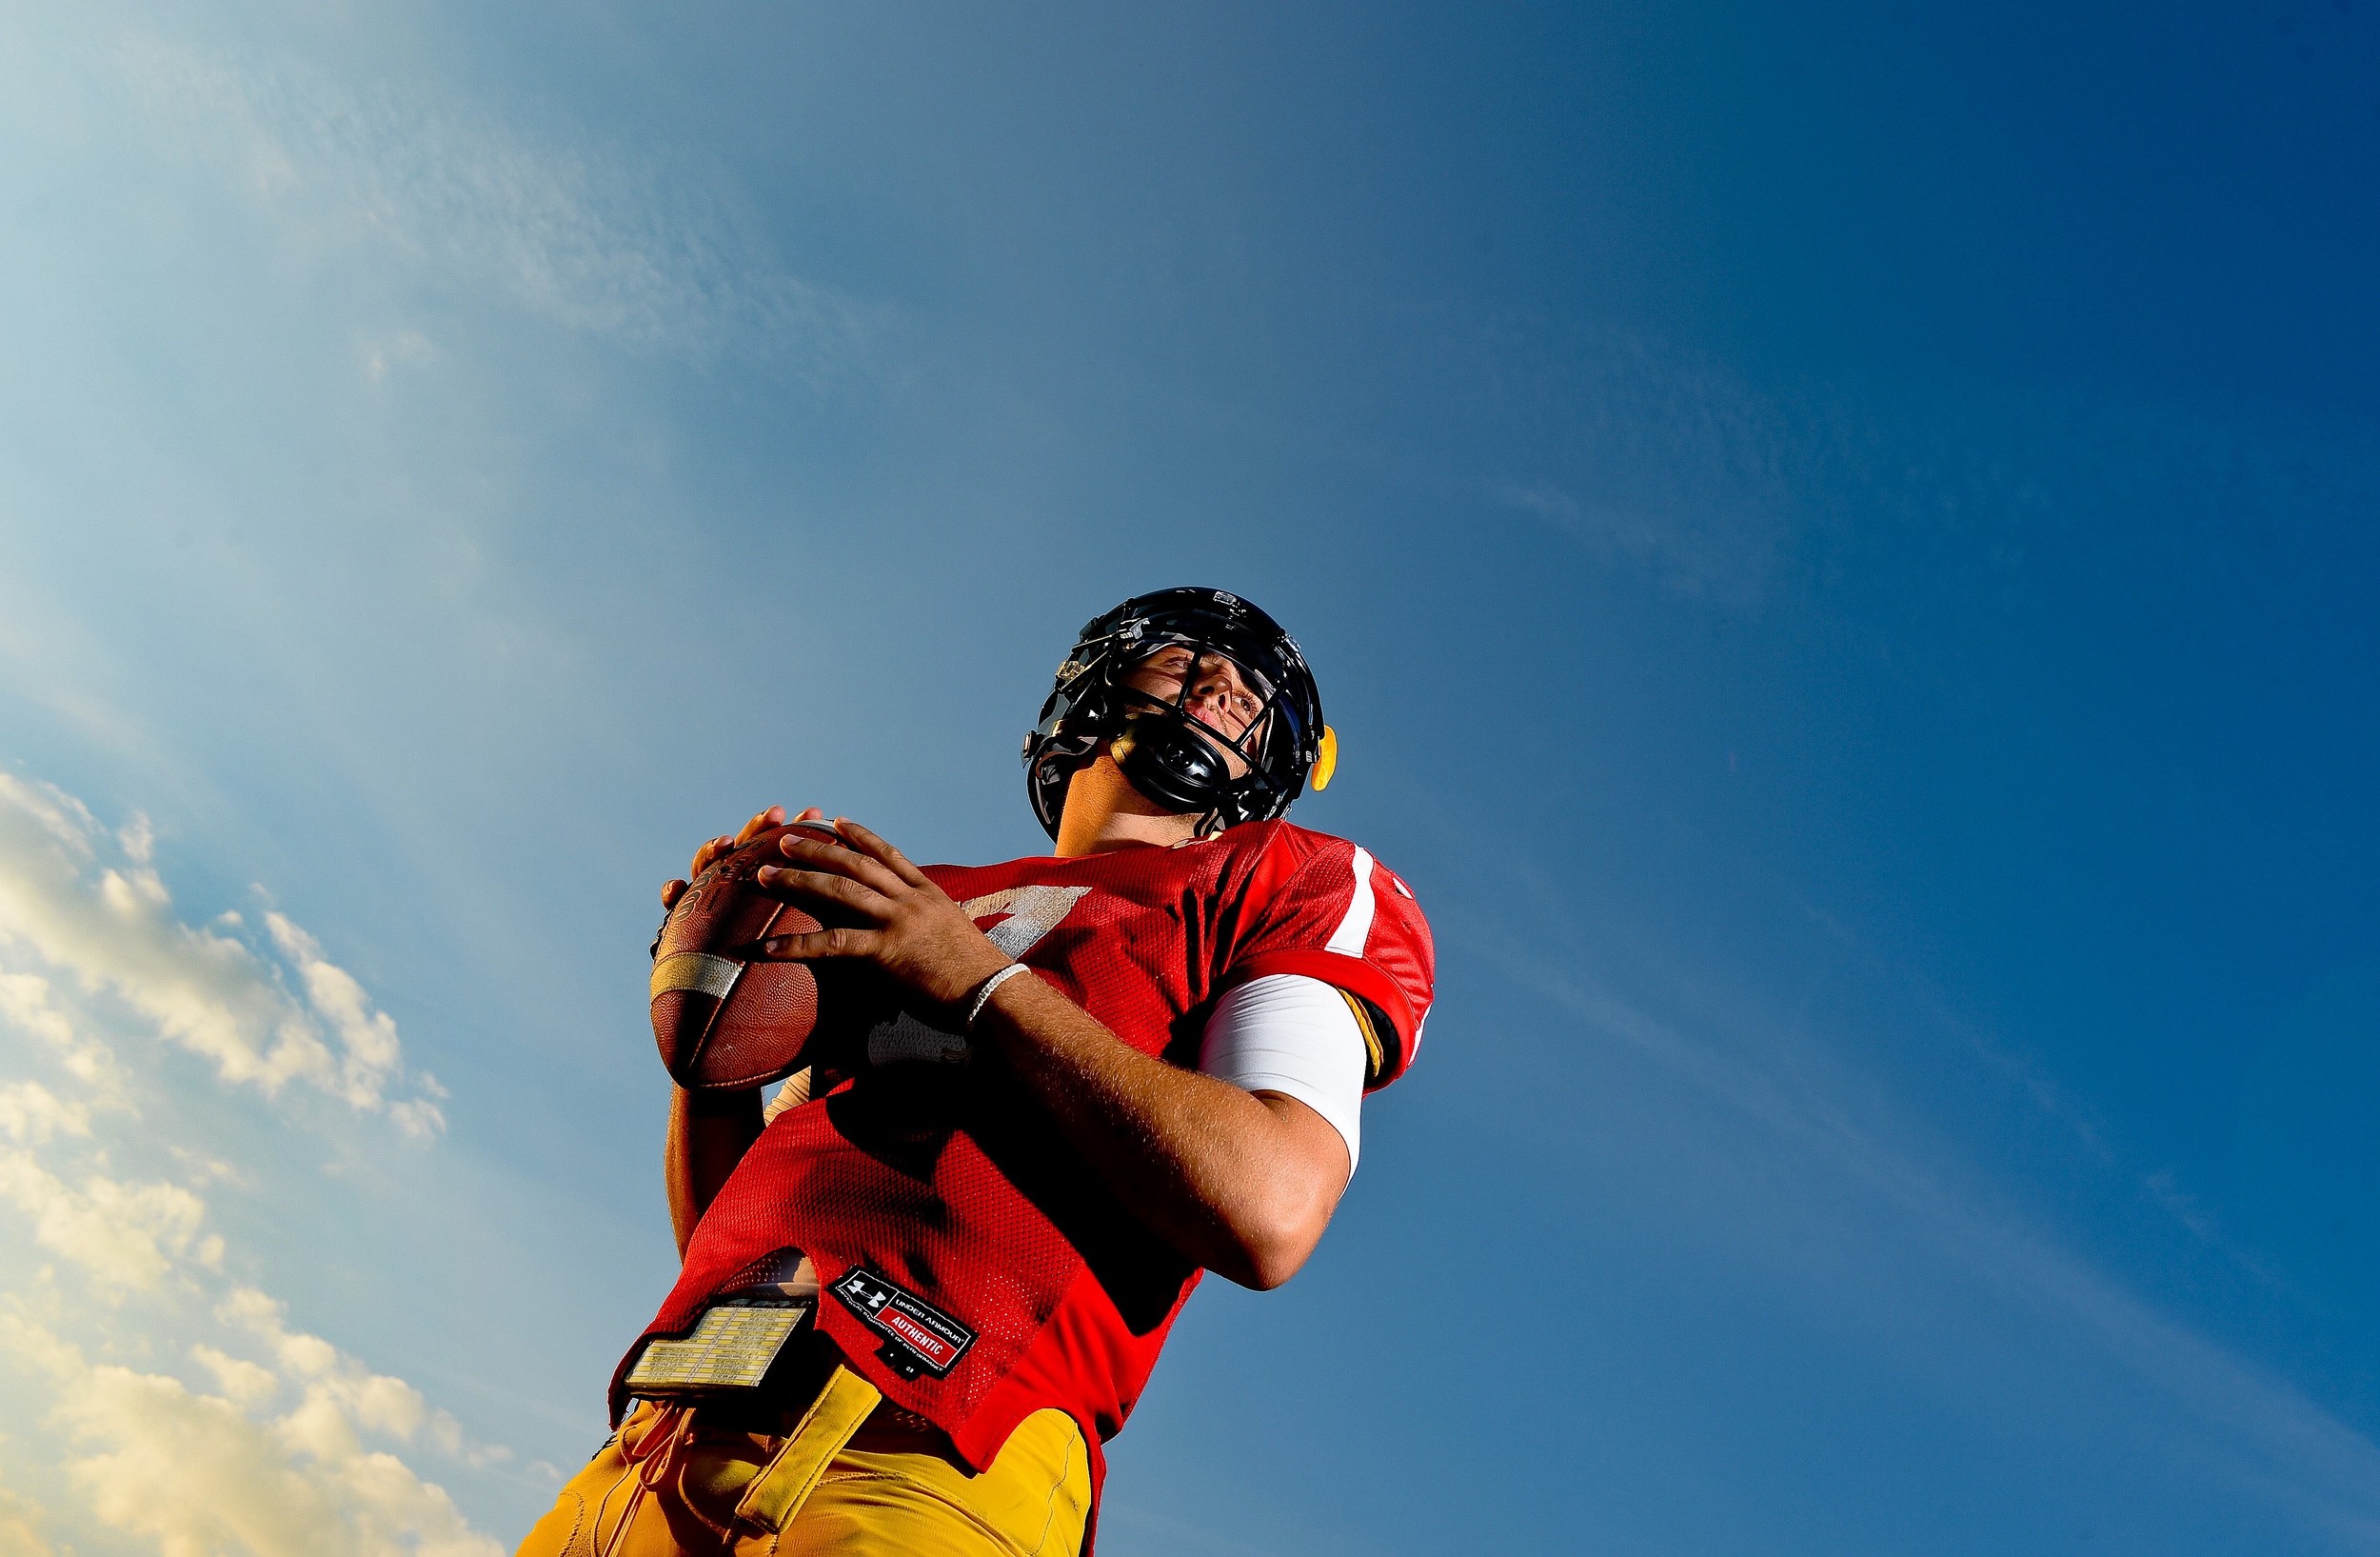 Towson University quarterback Peter Athens poses at Johnny Unitas Stadium on Oct. 1, 2013 in Baltimore, Md.